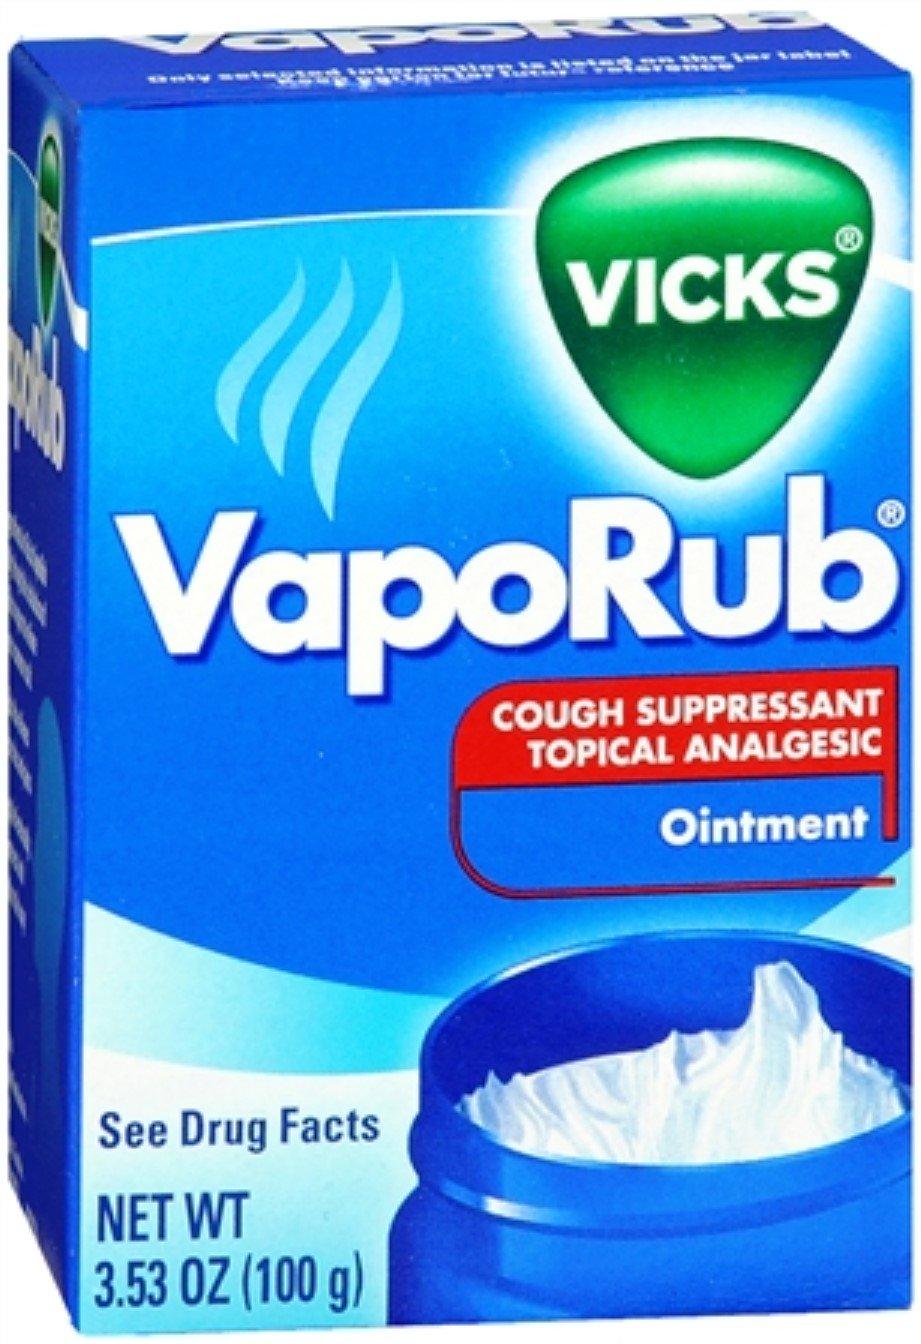 Vicks VapoRub Ointment 3.53 oz (Pack of 6) by Vicks